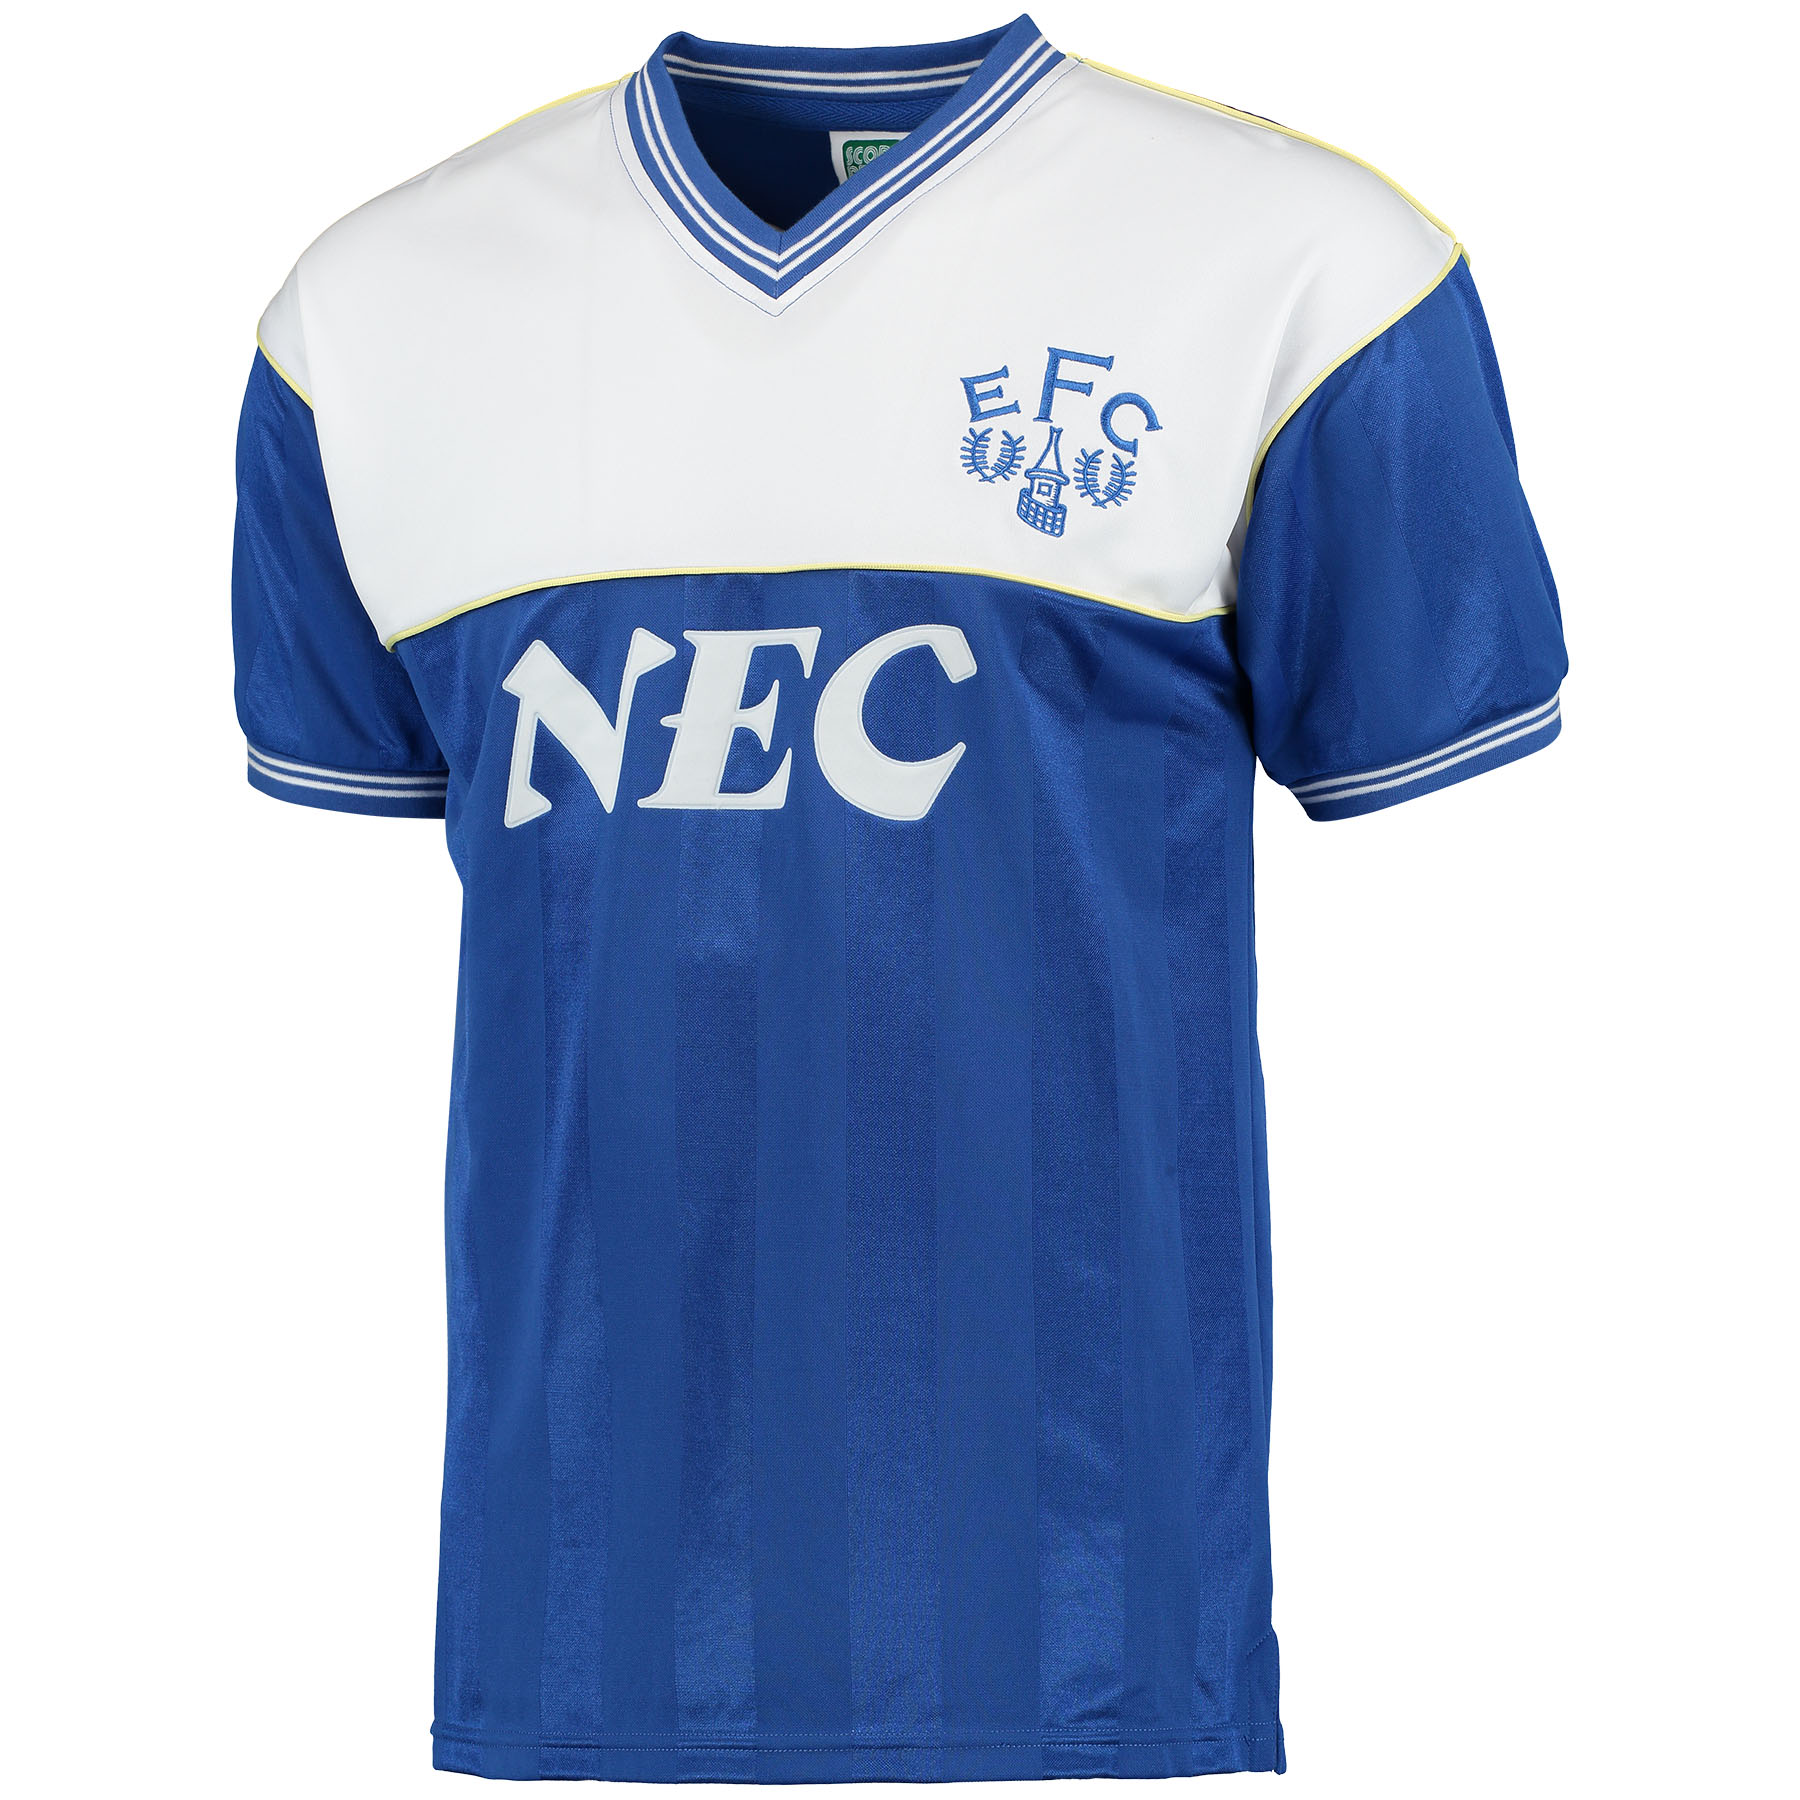 Image of Everton 1986 Shirt